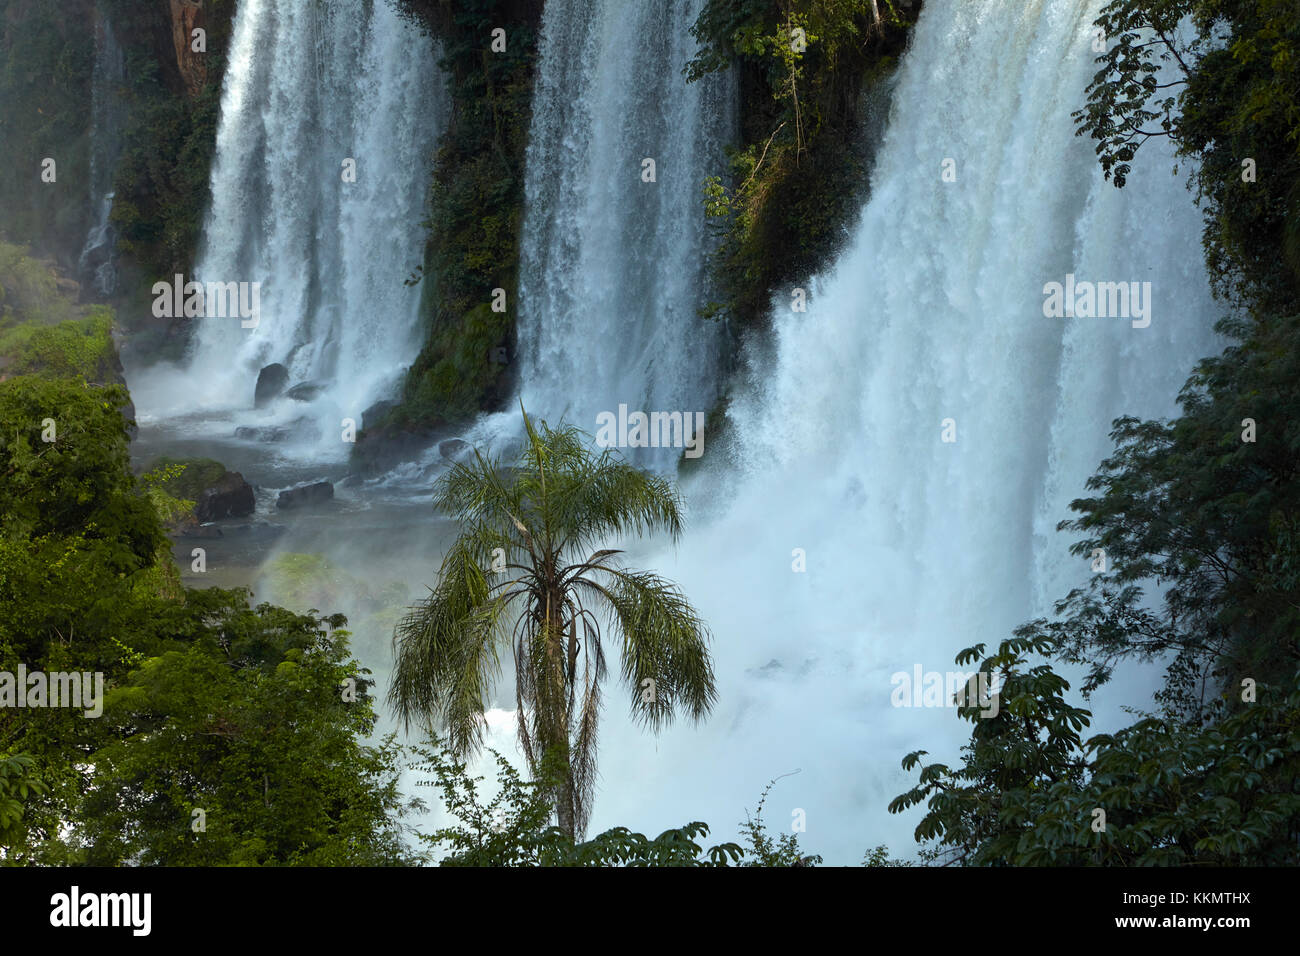 Iguazu Falls, Argentina, South America Stock Photo